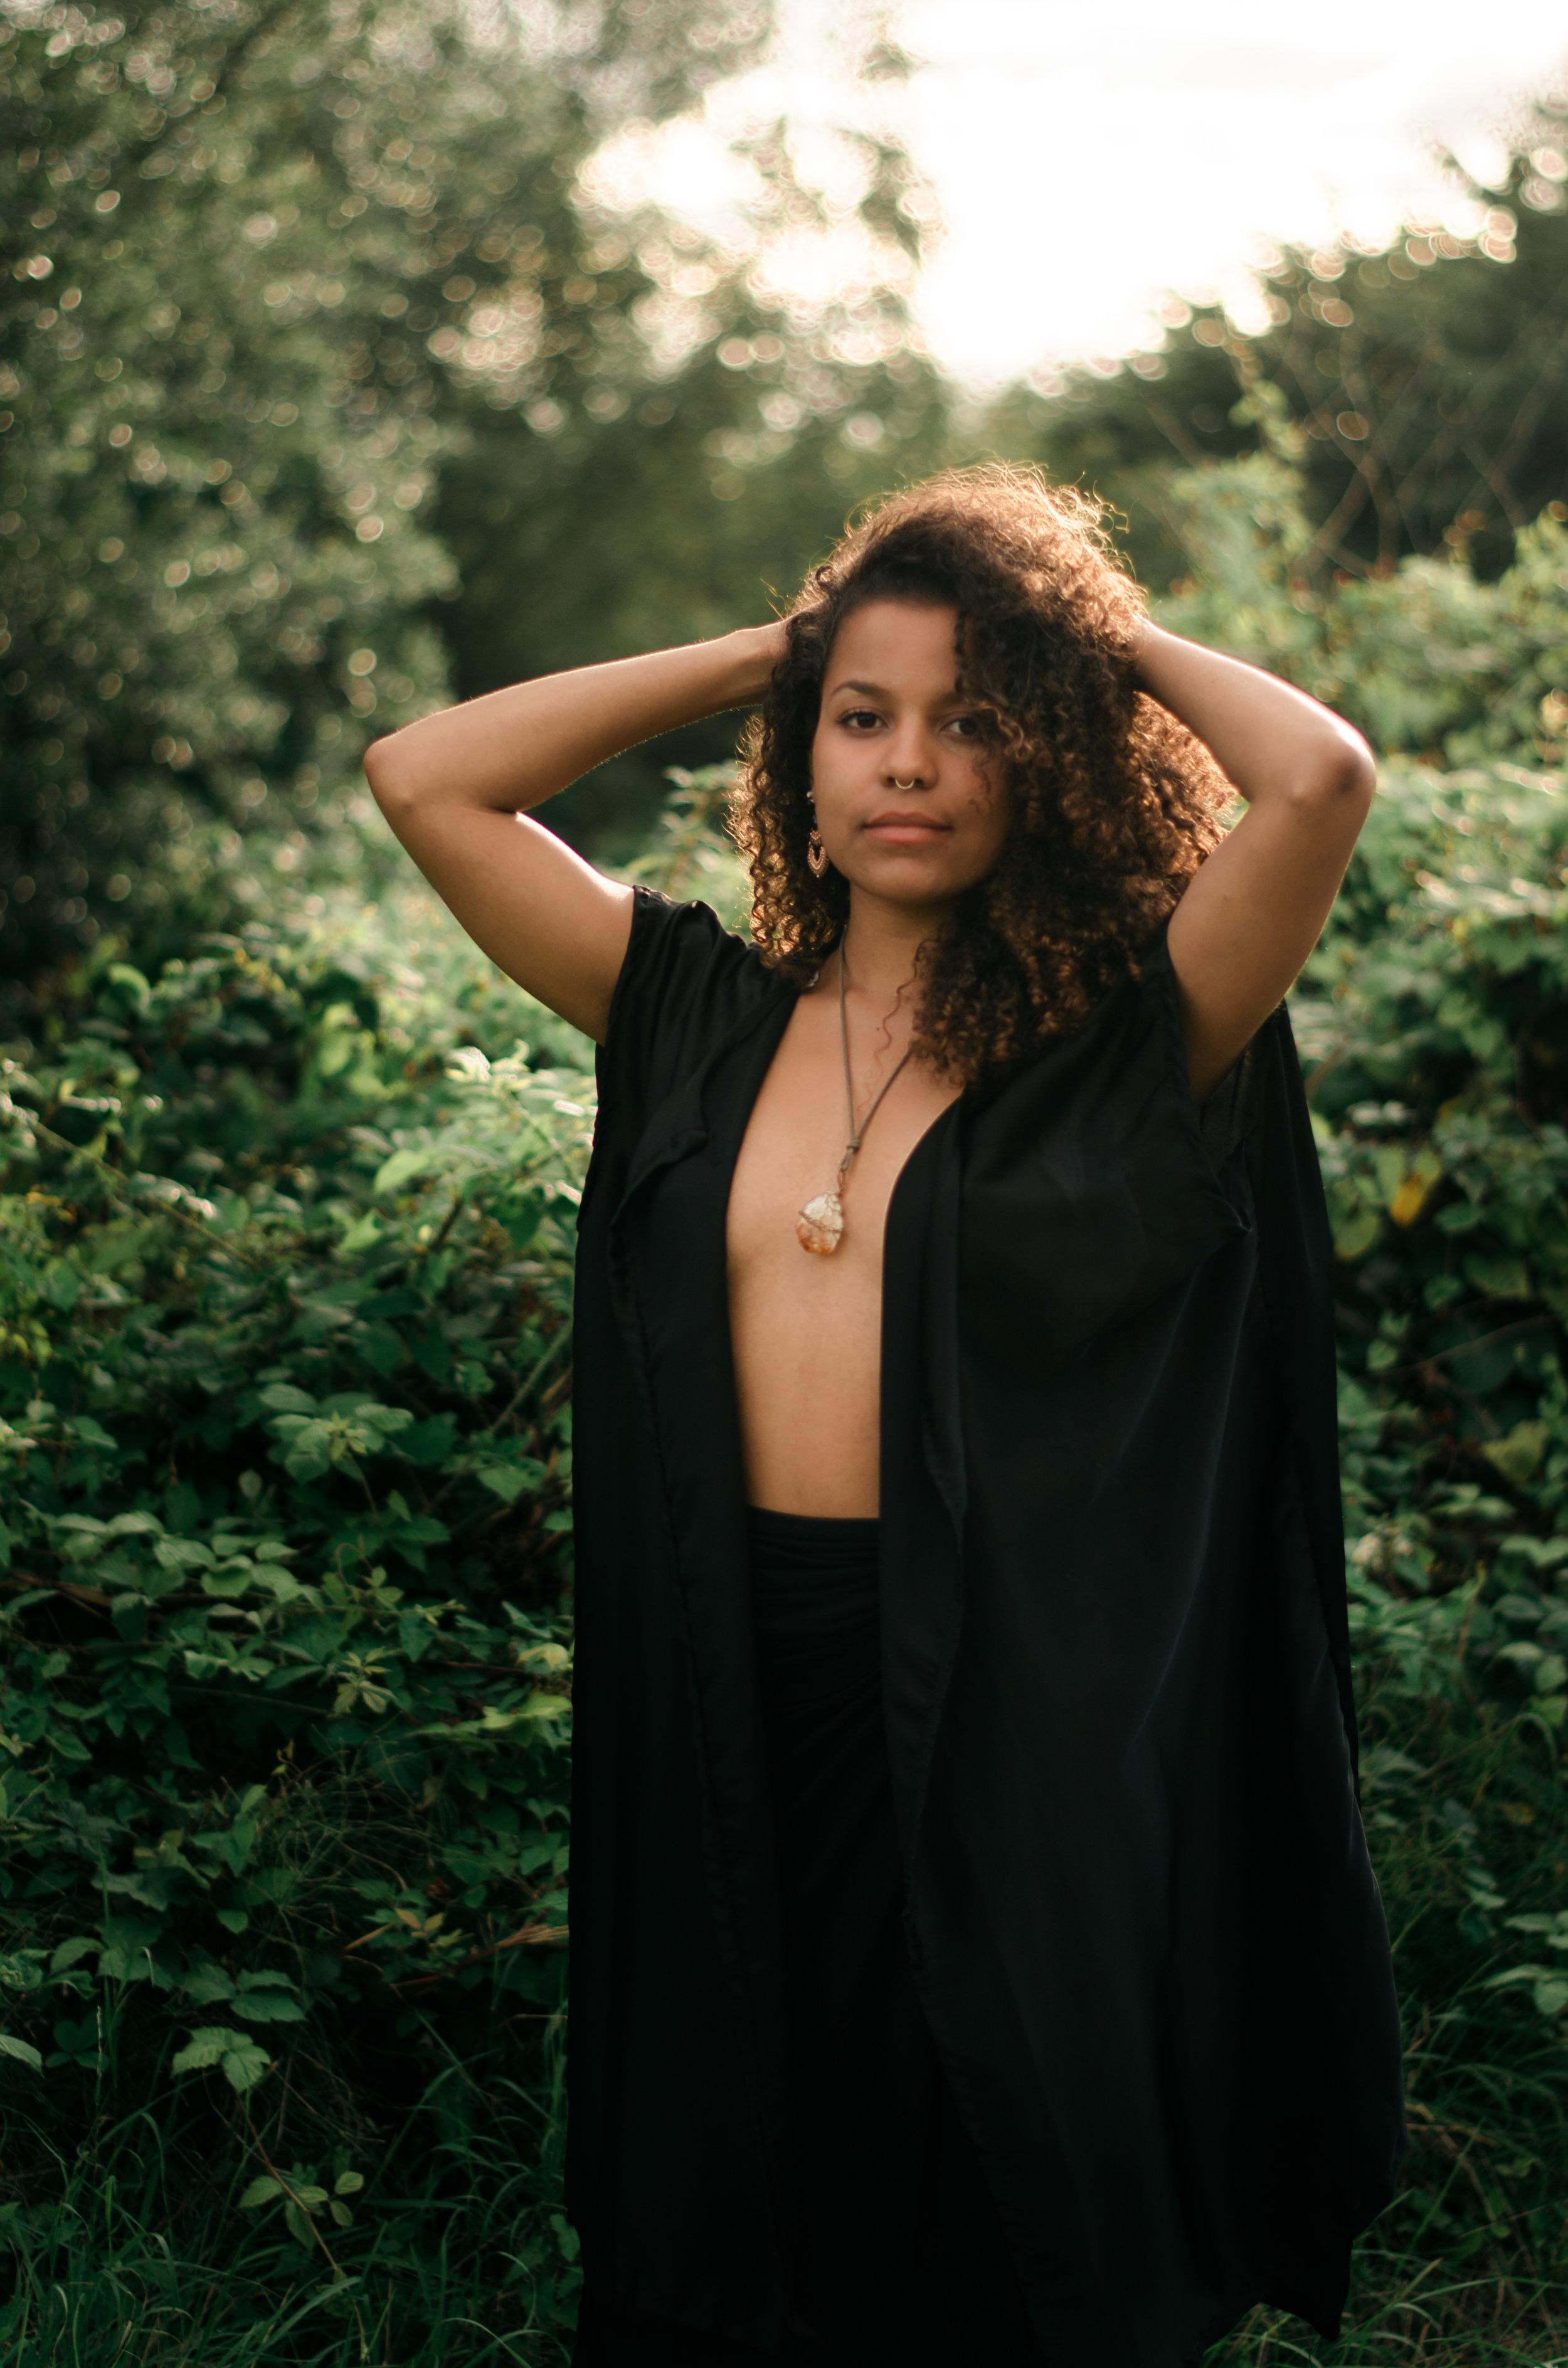 Inka-Portrait-Session-Aiste-Saulyte-Photography-17-07-30-192.jpg